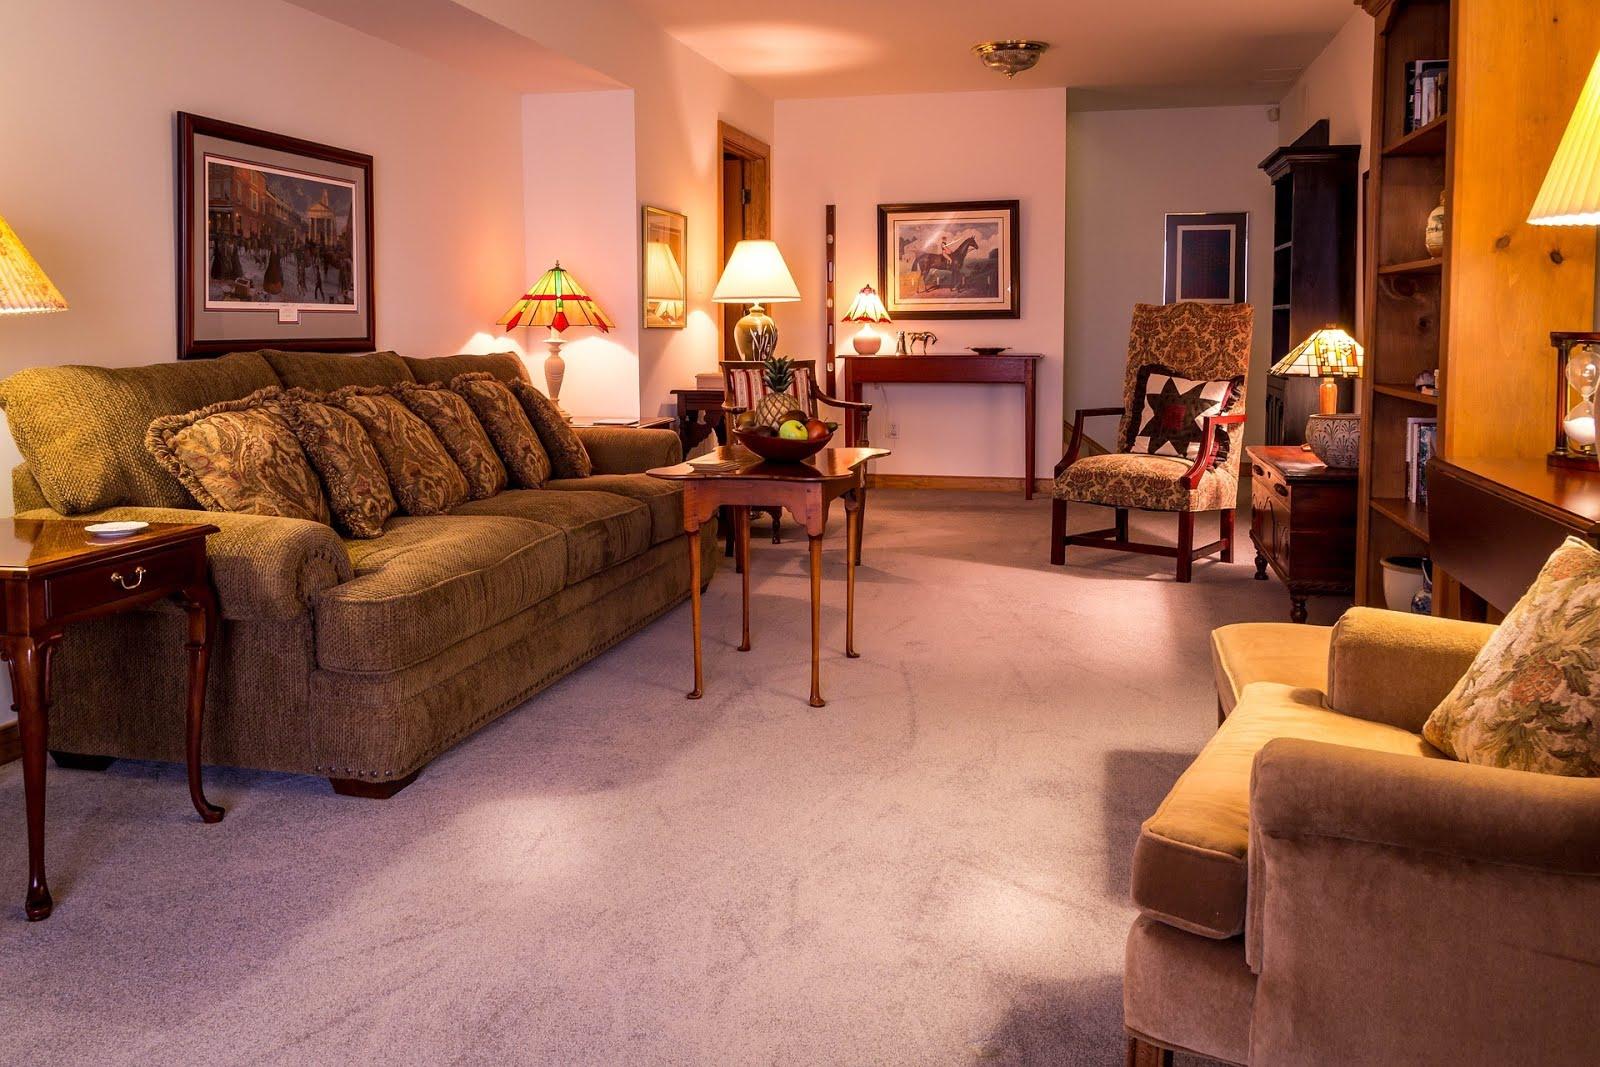 Jika Anda Mau Menggunakan Karpet Untuk Memberesi Ruang Tetamu Tempatkan Daerah Duduk Sehingga Kaki Tempat Benar Di Dalam Zona